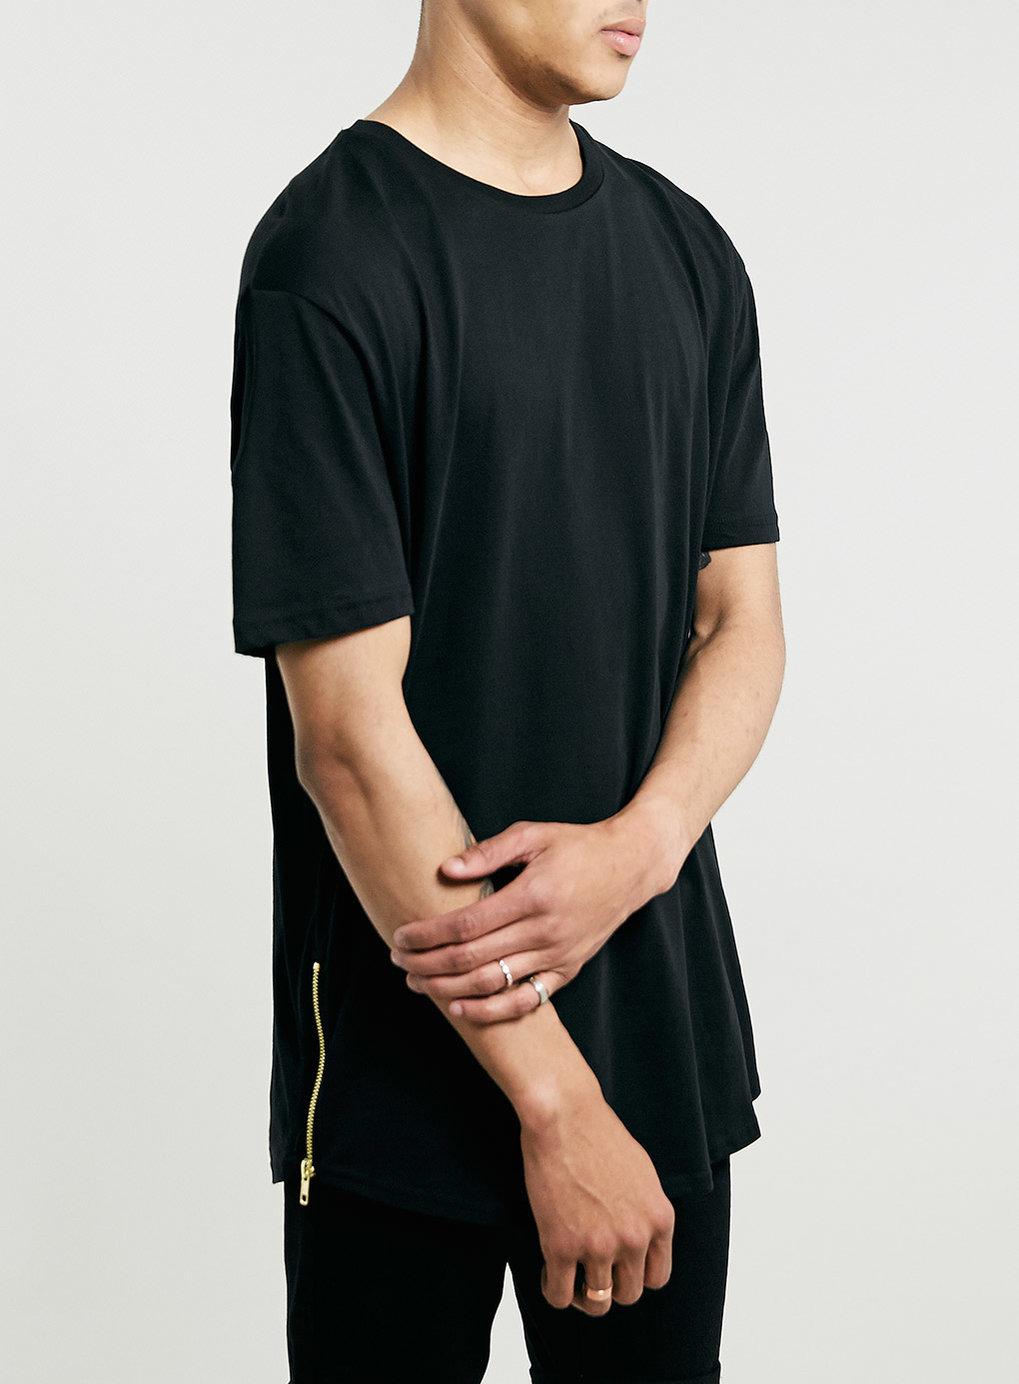 Black t shirt topman - Black Zips Skater T Shirt Men S T Shirts Vests Clothing